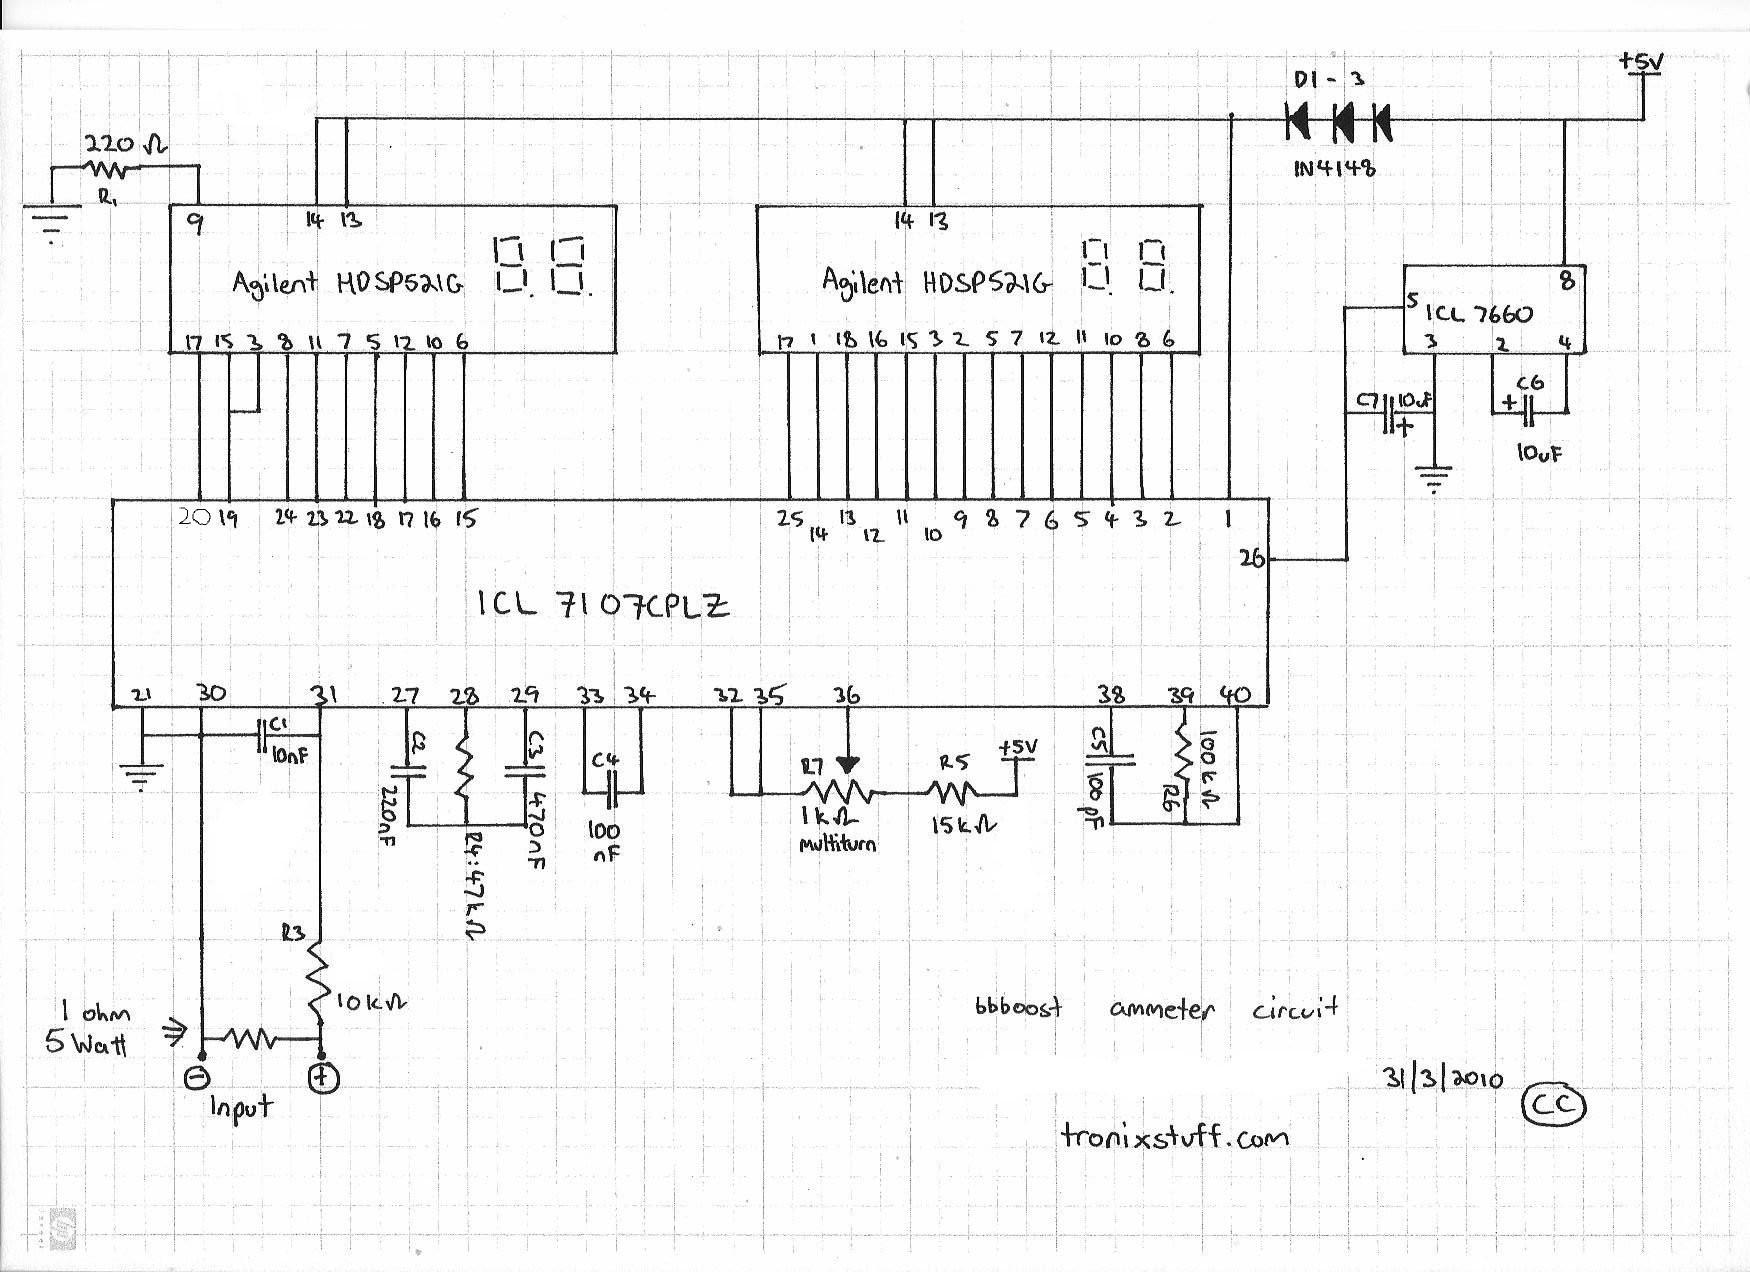 Index Ammeter Jpg electrical wiring schematics electronic diagram symbols schematic